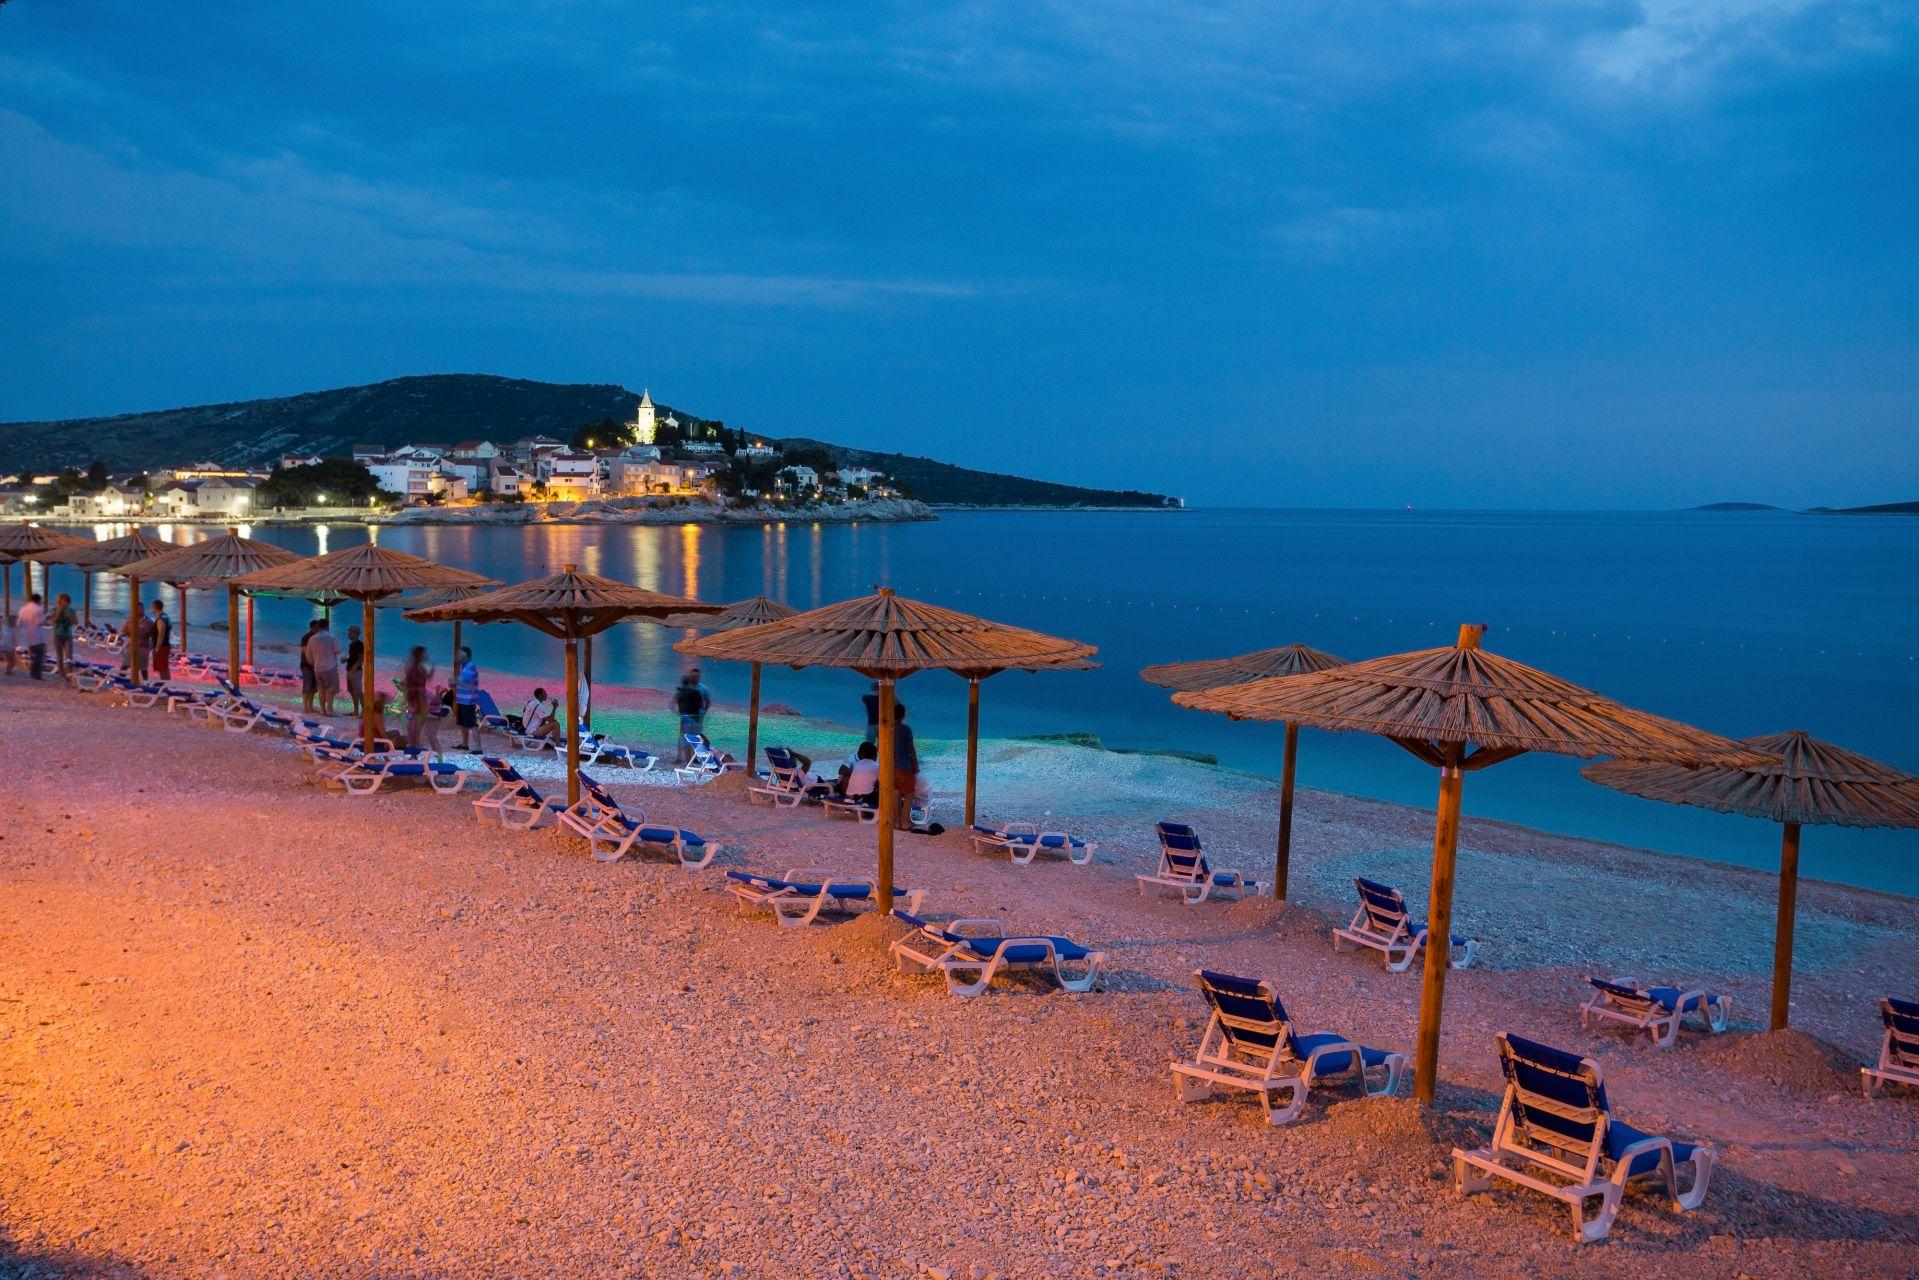 beach 08 14638499270 o 1 - Zora Hotel